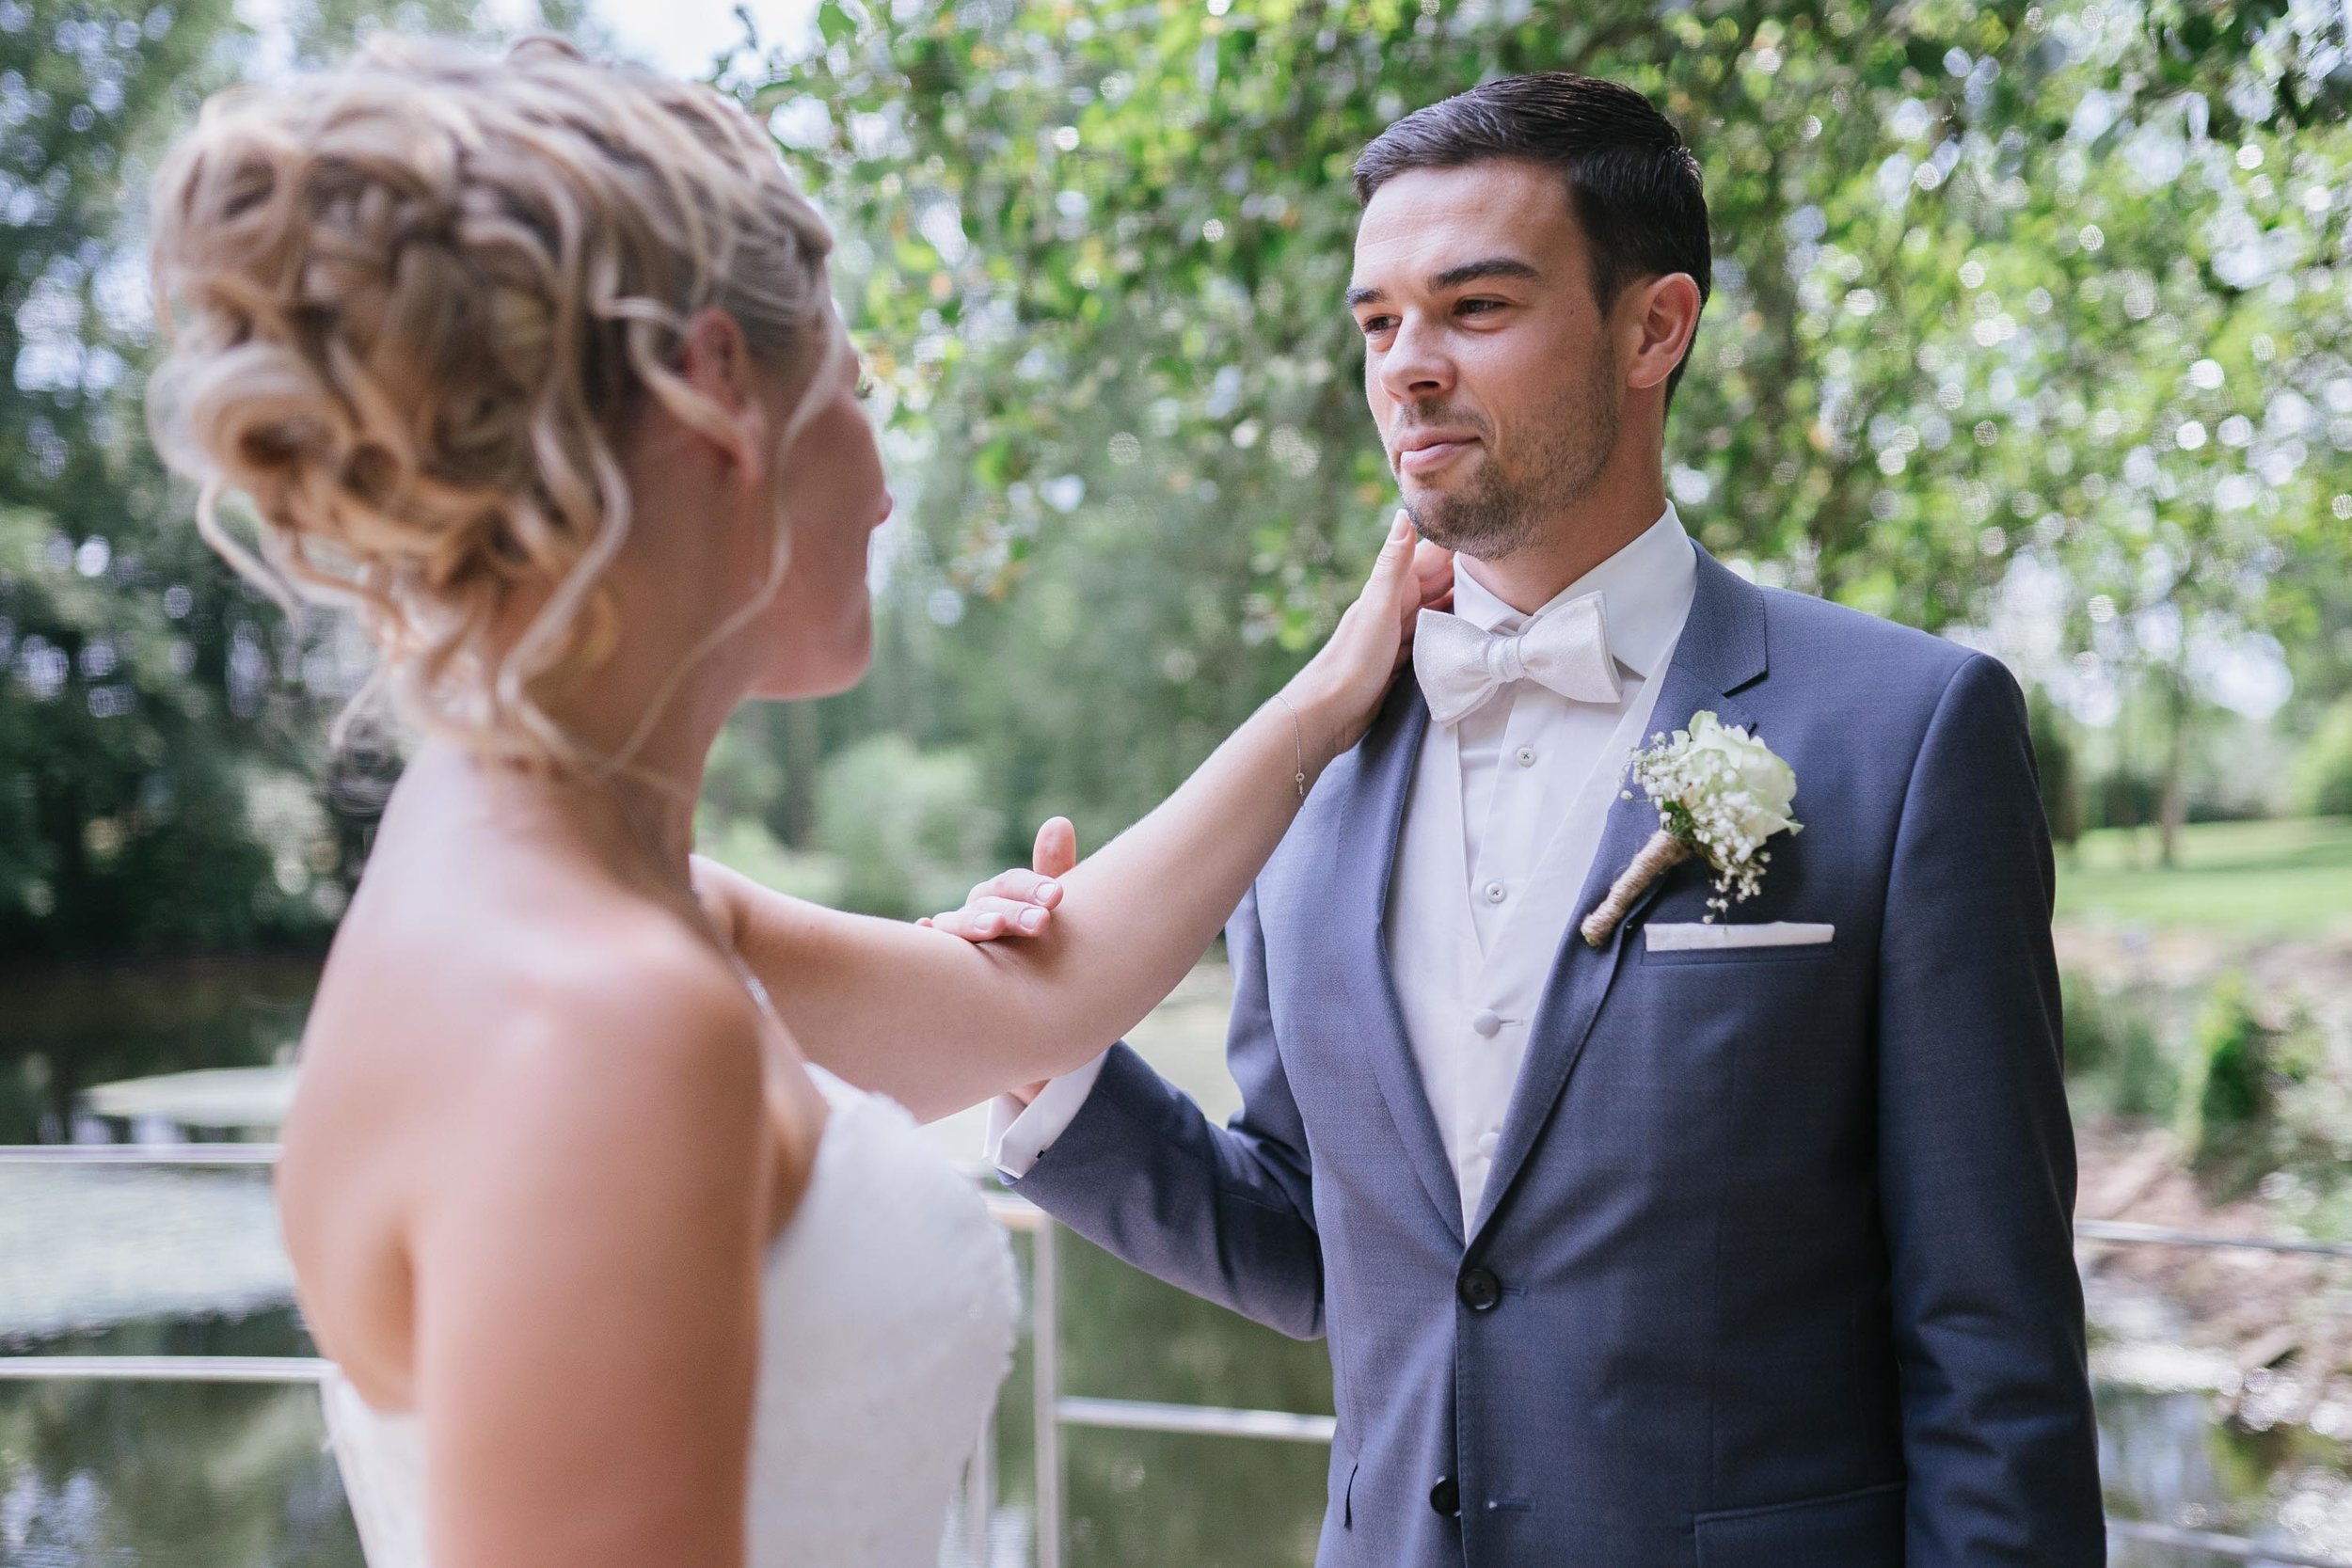 photographe-videaste-bruxelles-mariage-reportage-leleu-10.jpg